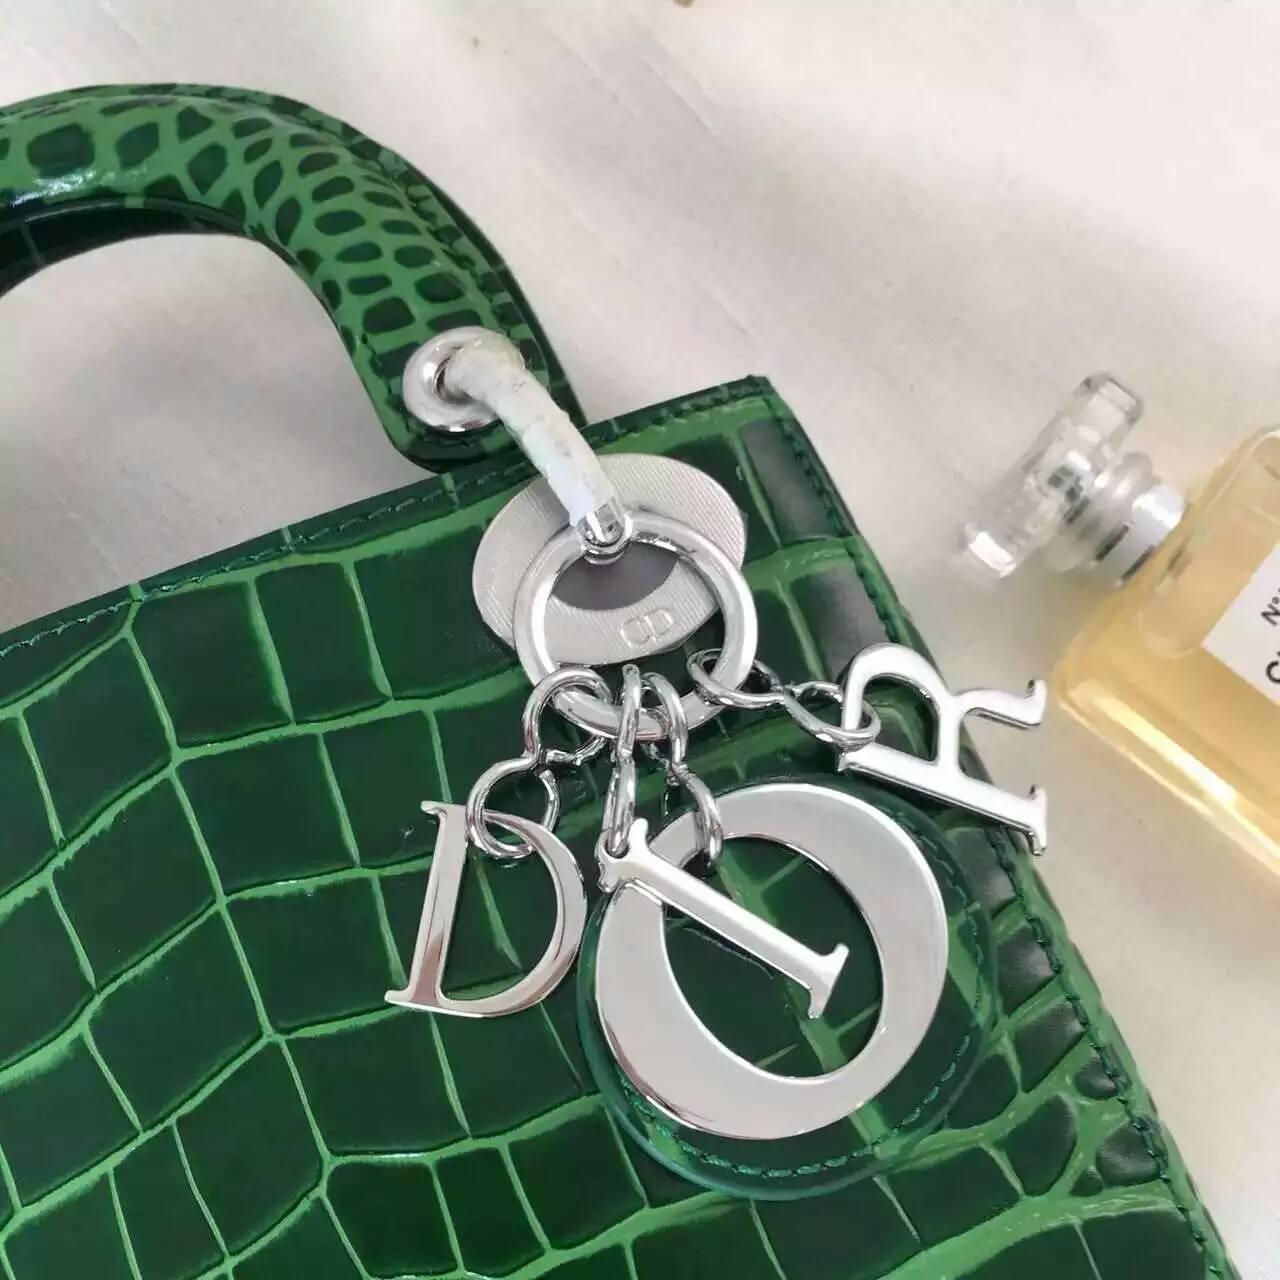 Dior迪奥包包官网 Lady Dior进口小牛皮压鳄鱼纹三格戴妃包 马卡龙绿色